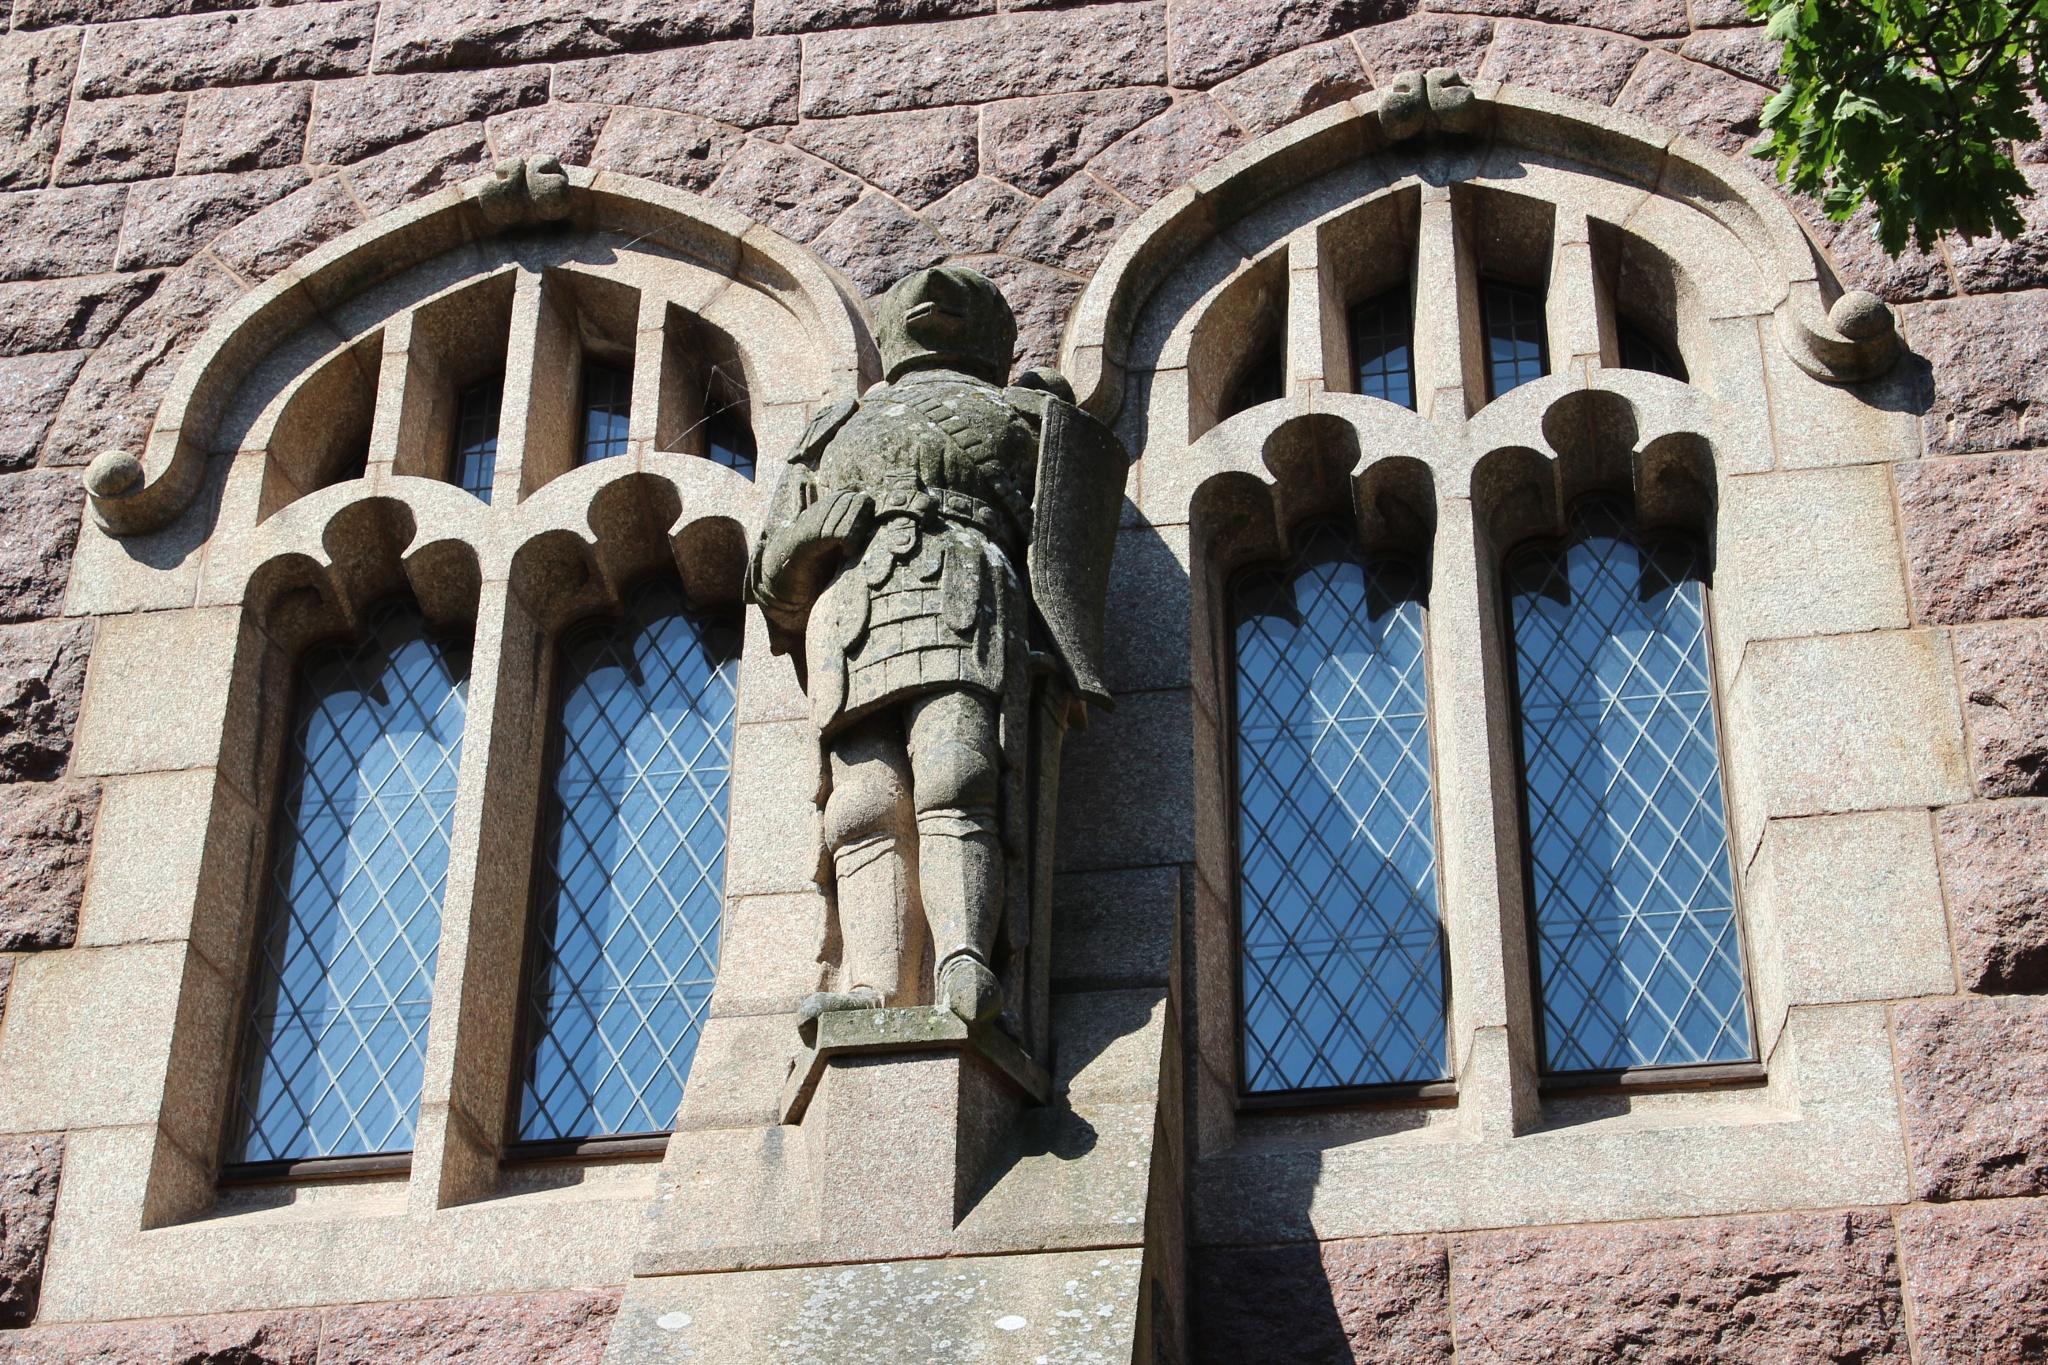 Stone knight by heidi.svahn1